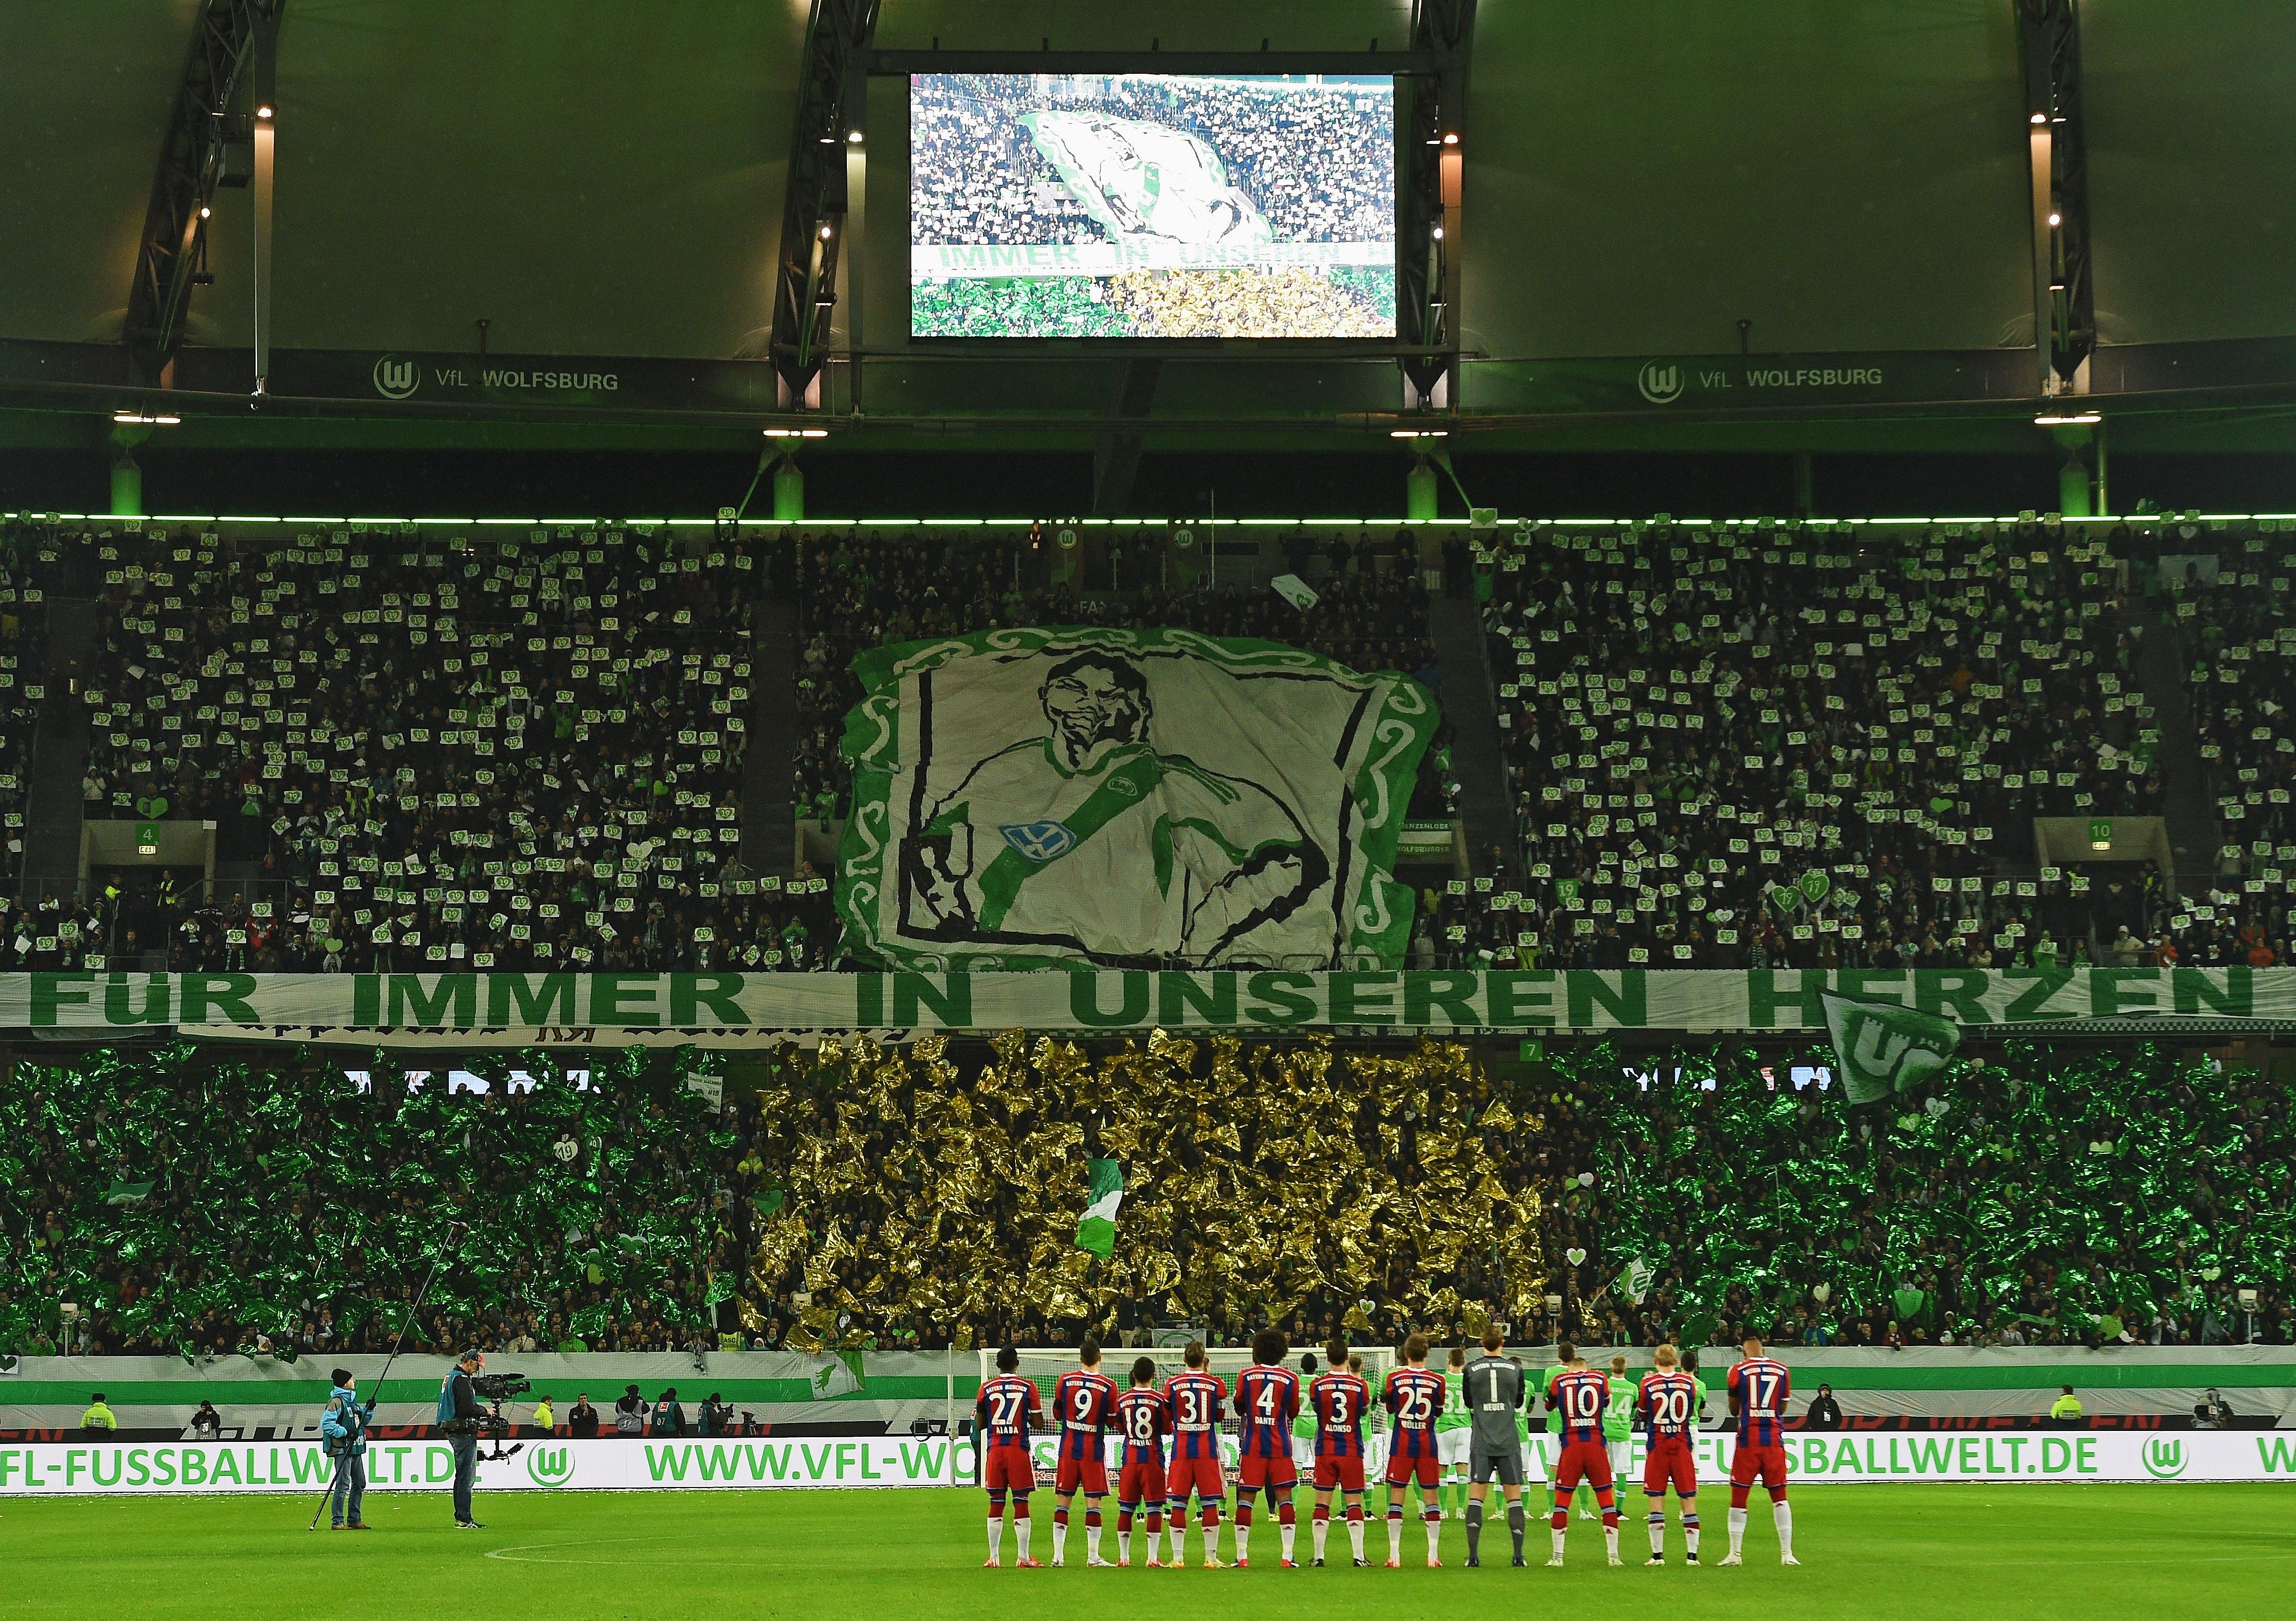 Momentos emocionantes Bundesliga 2014/15